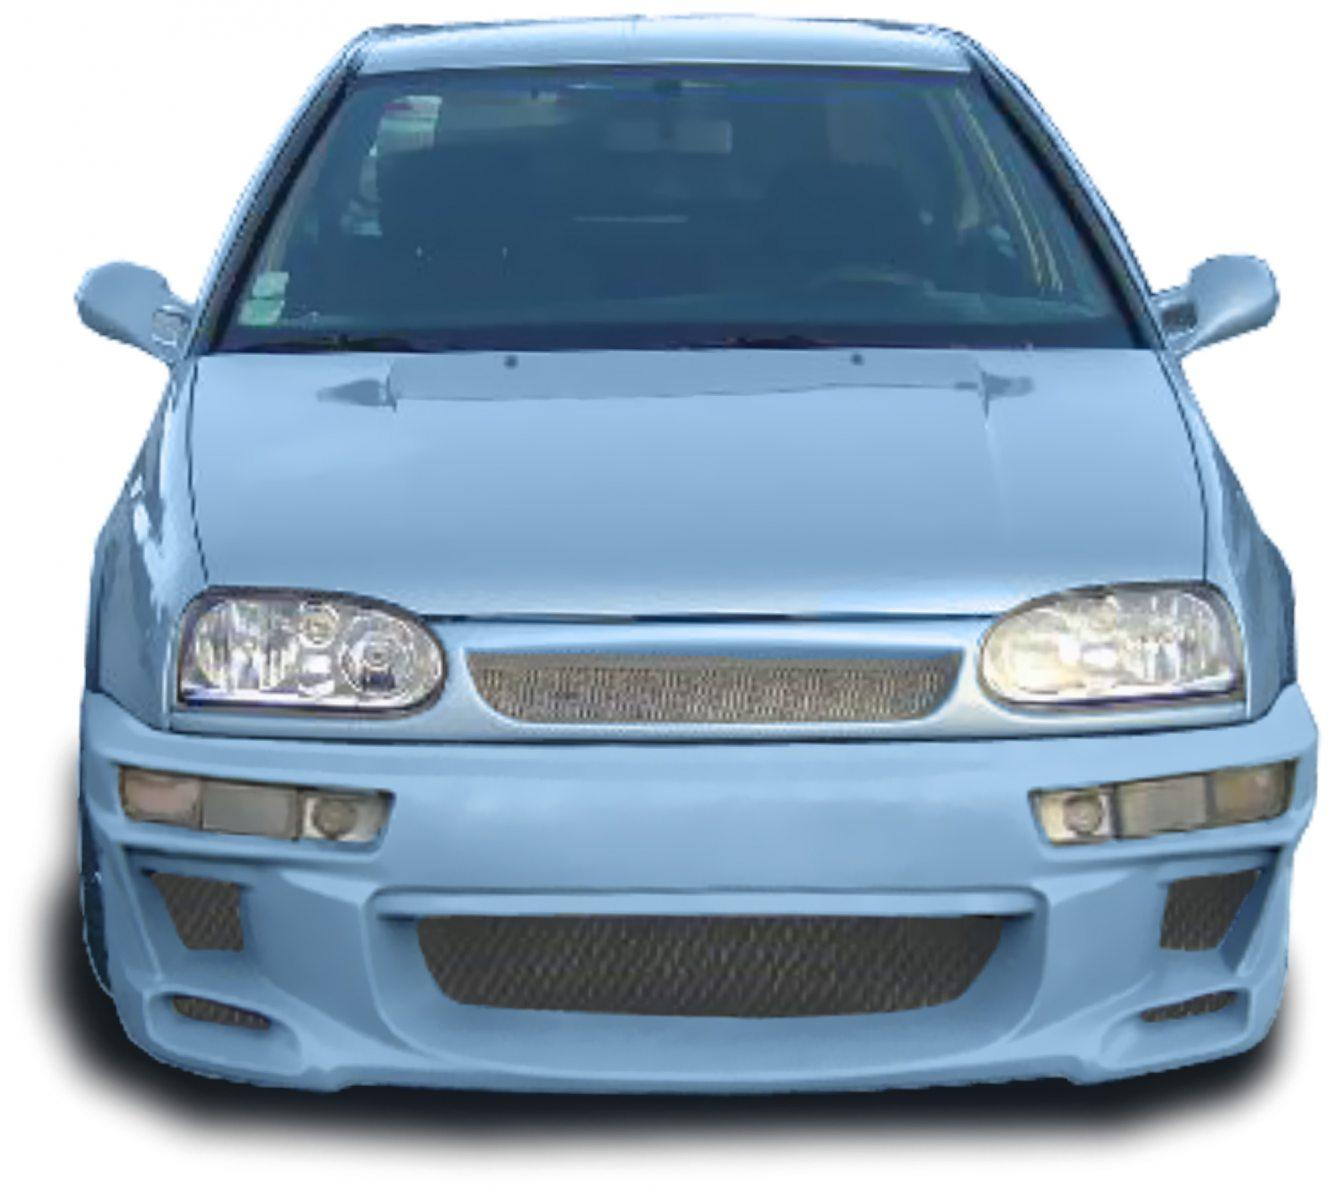 VW-Golf-III-Lagune-Frt-PCU1114.1